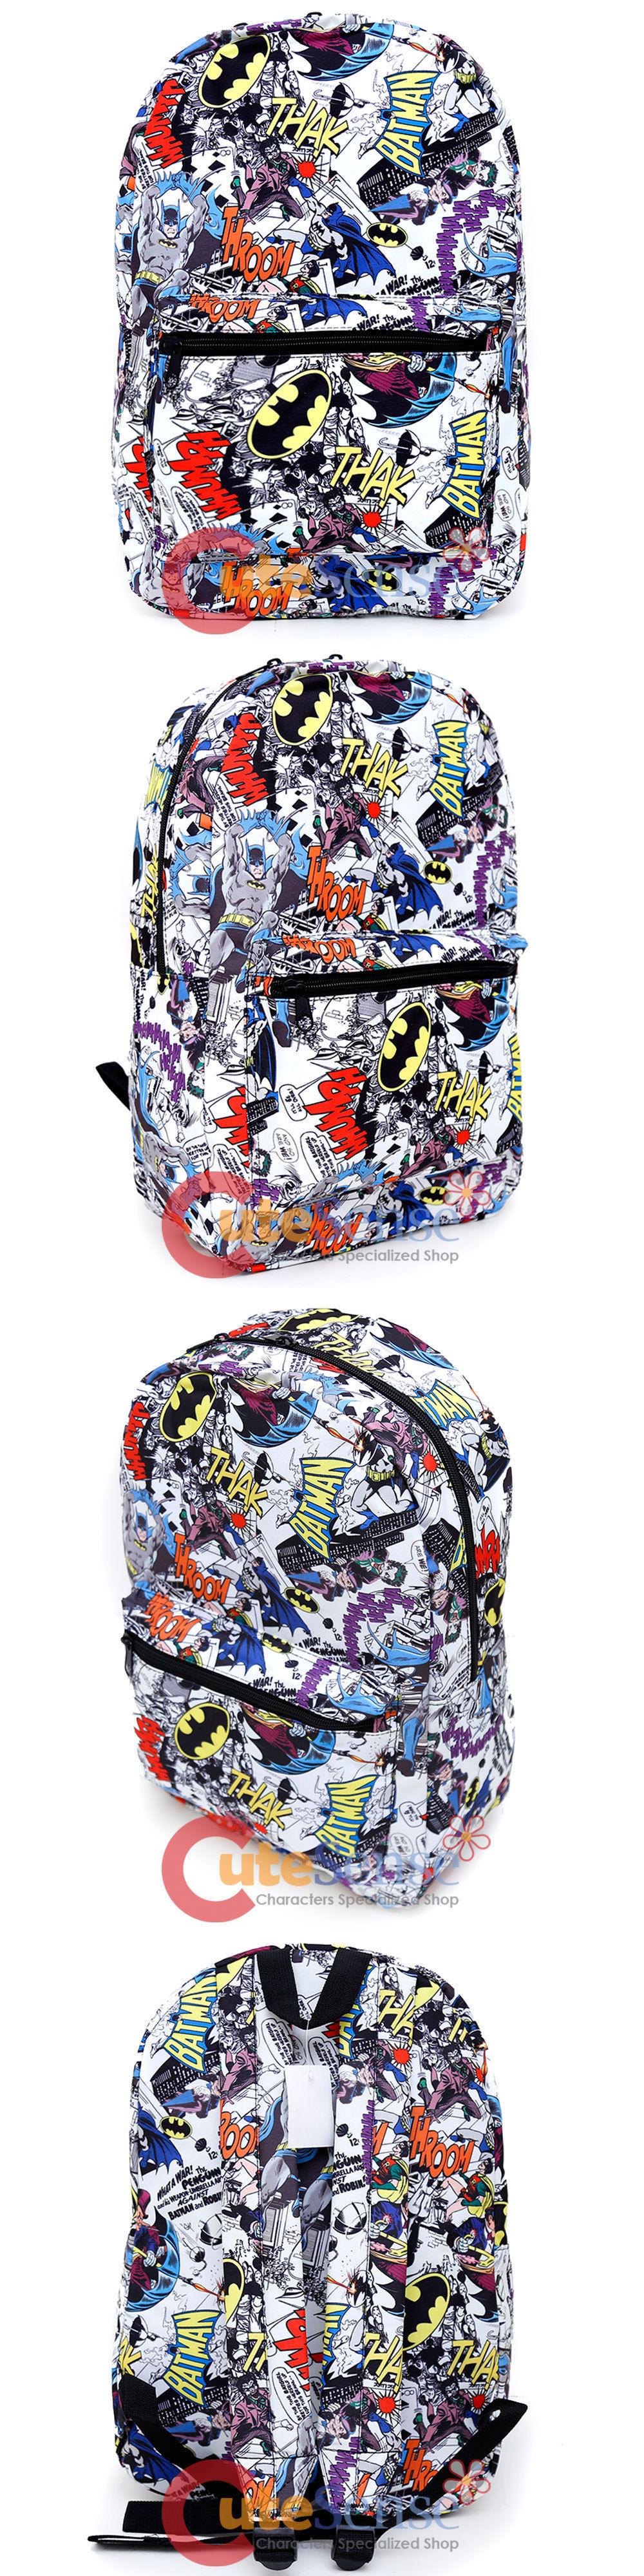 batman dc ics large school backpack 17 all over prints